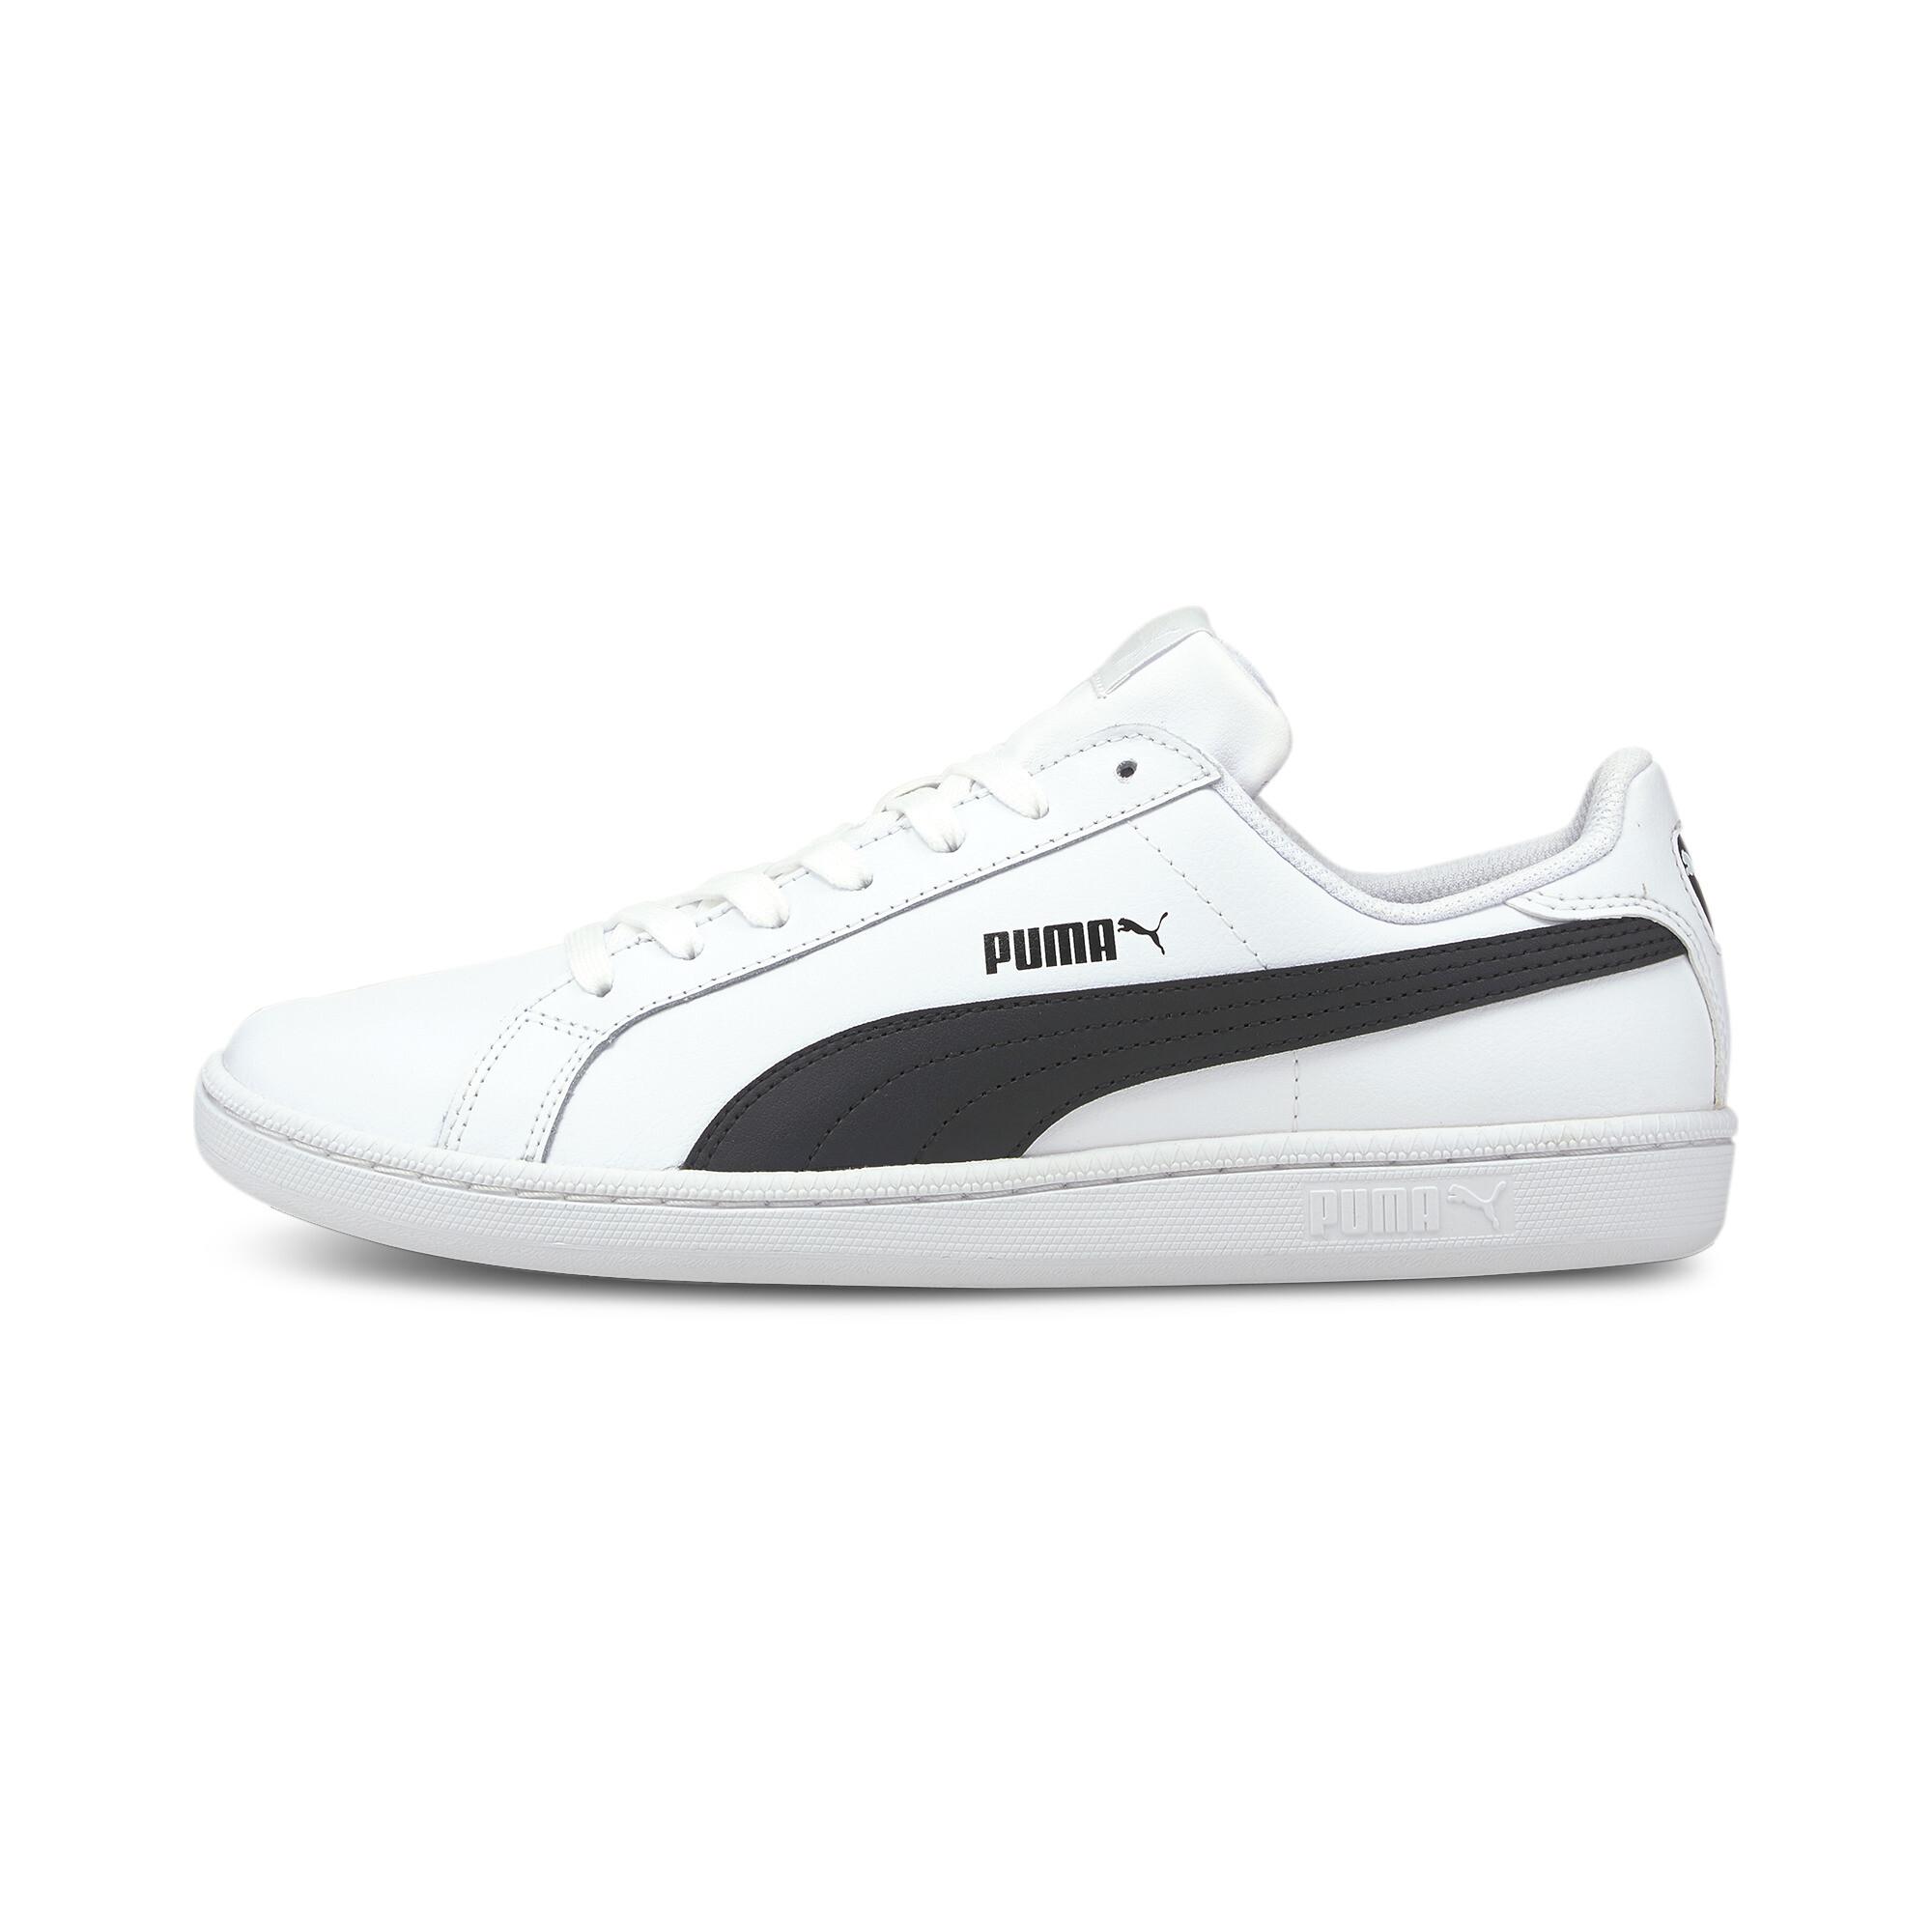 PUMA-Smash-Trainers-Schuhe-Sneakers-Sport-Classics-Unisex-Neu Indexbild 9